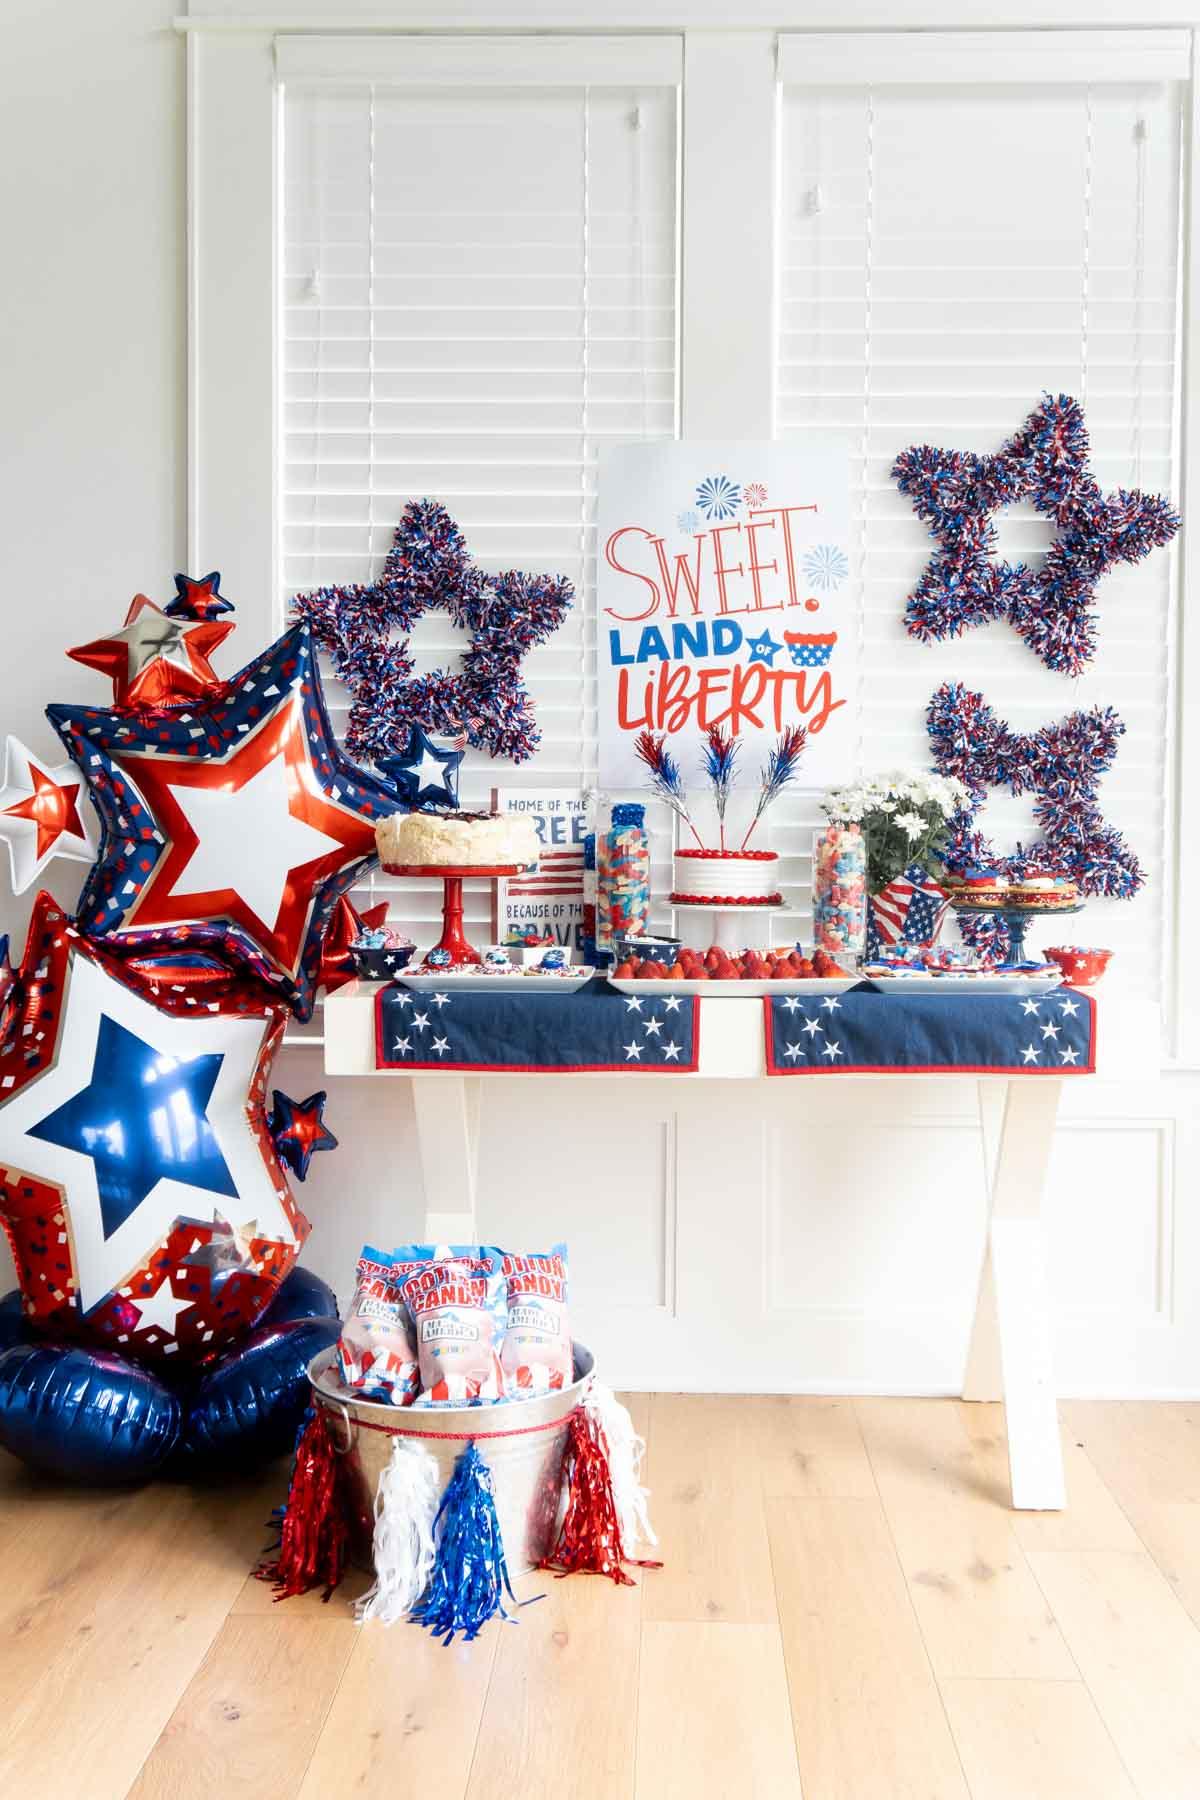 sweet land of liberty table